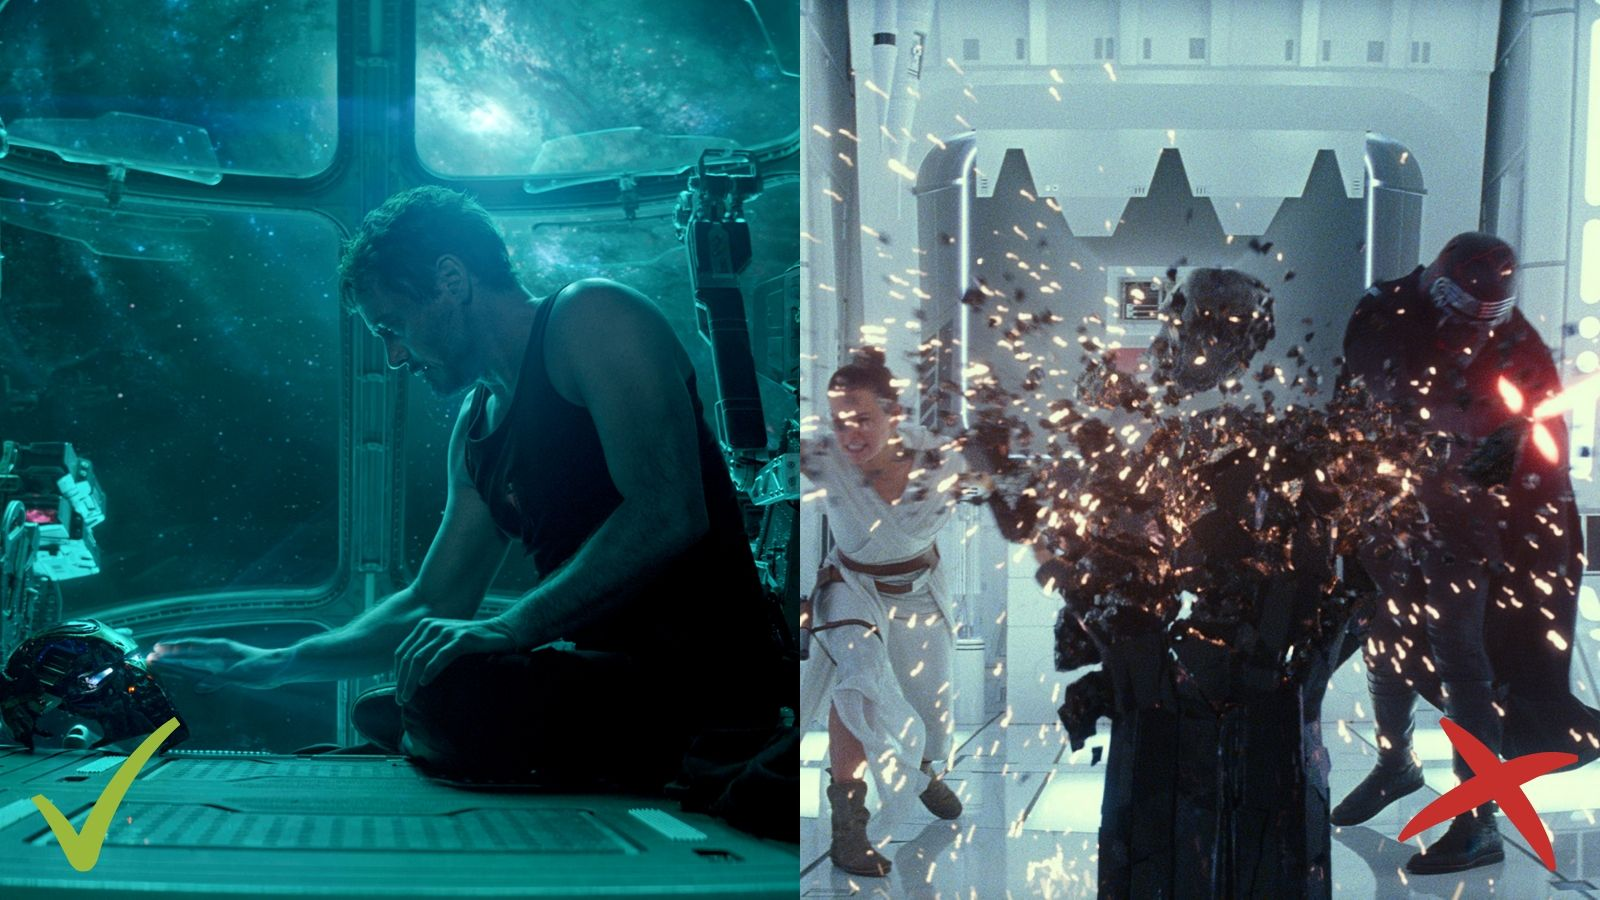 Avengers: Endgame, Star Wars: The Rise of Skywalker, Atriebēji: Noslēgums, Zvaigžņu kari: Skaivokera atdzimšana